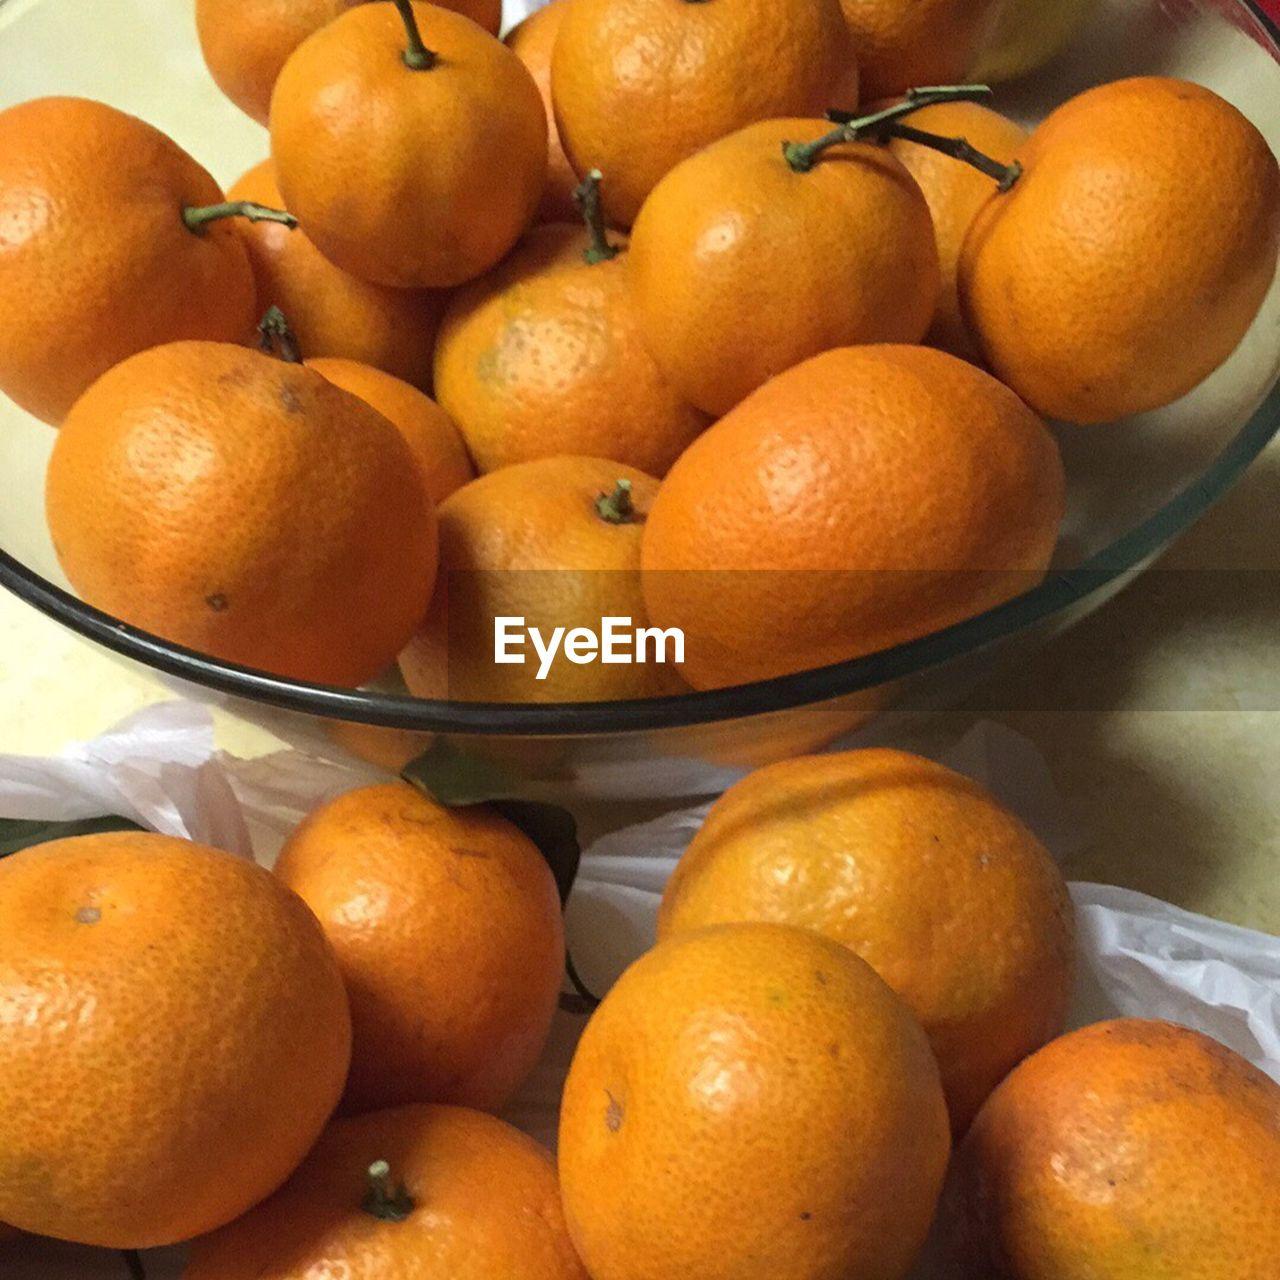 fruit, orange - fruit, orange color, food and drink, healthy eating, citrus fruit, freshness, food, large group of objects, no people, indoors, close-up, day